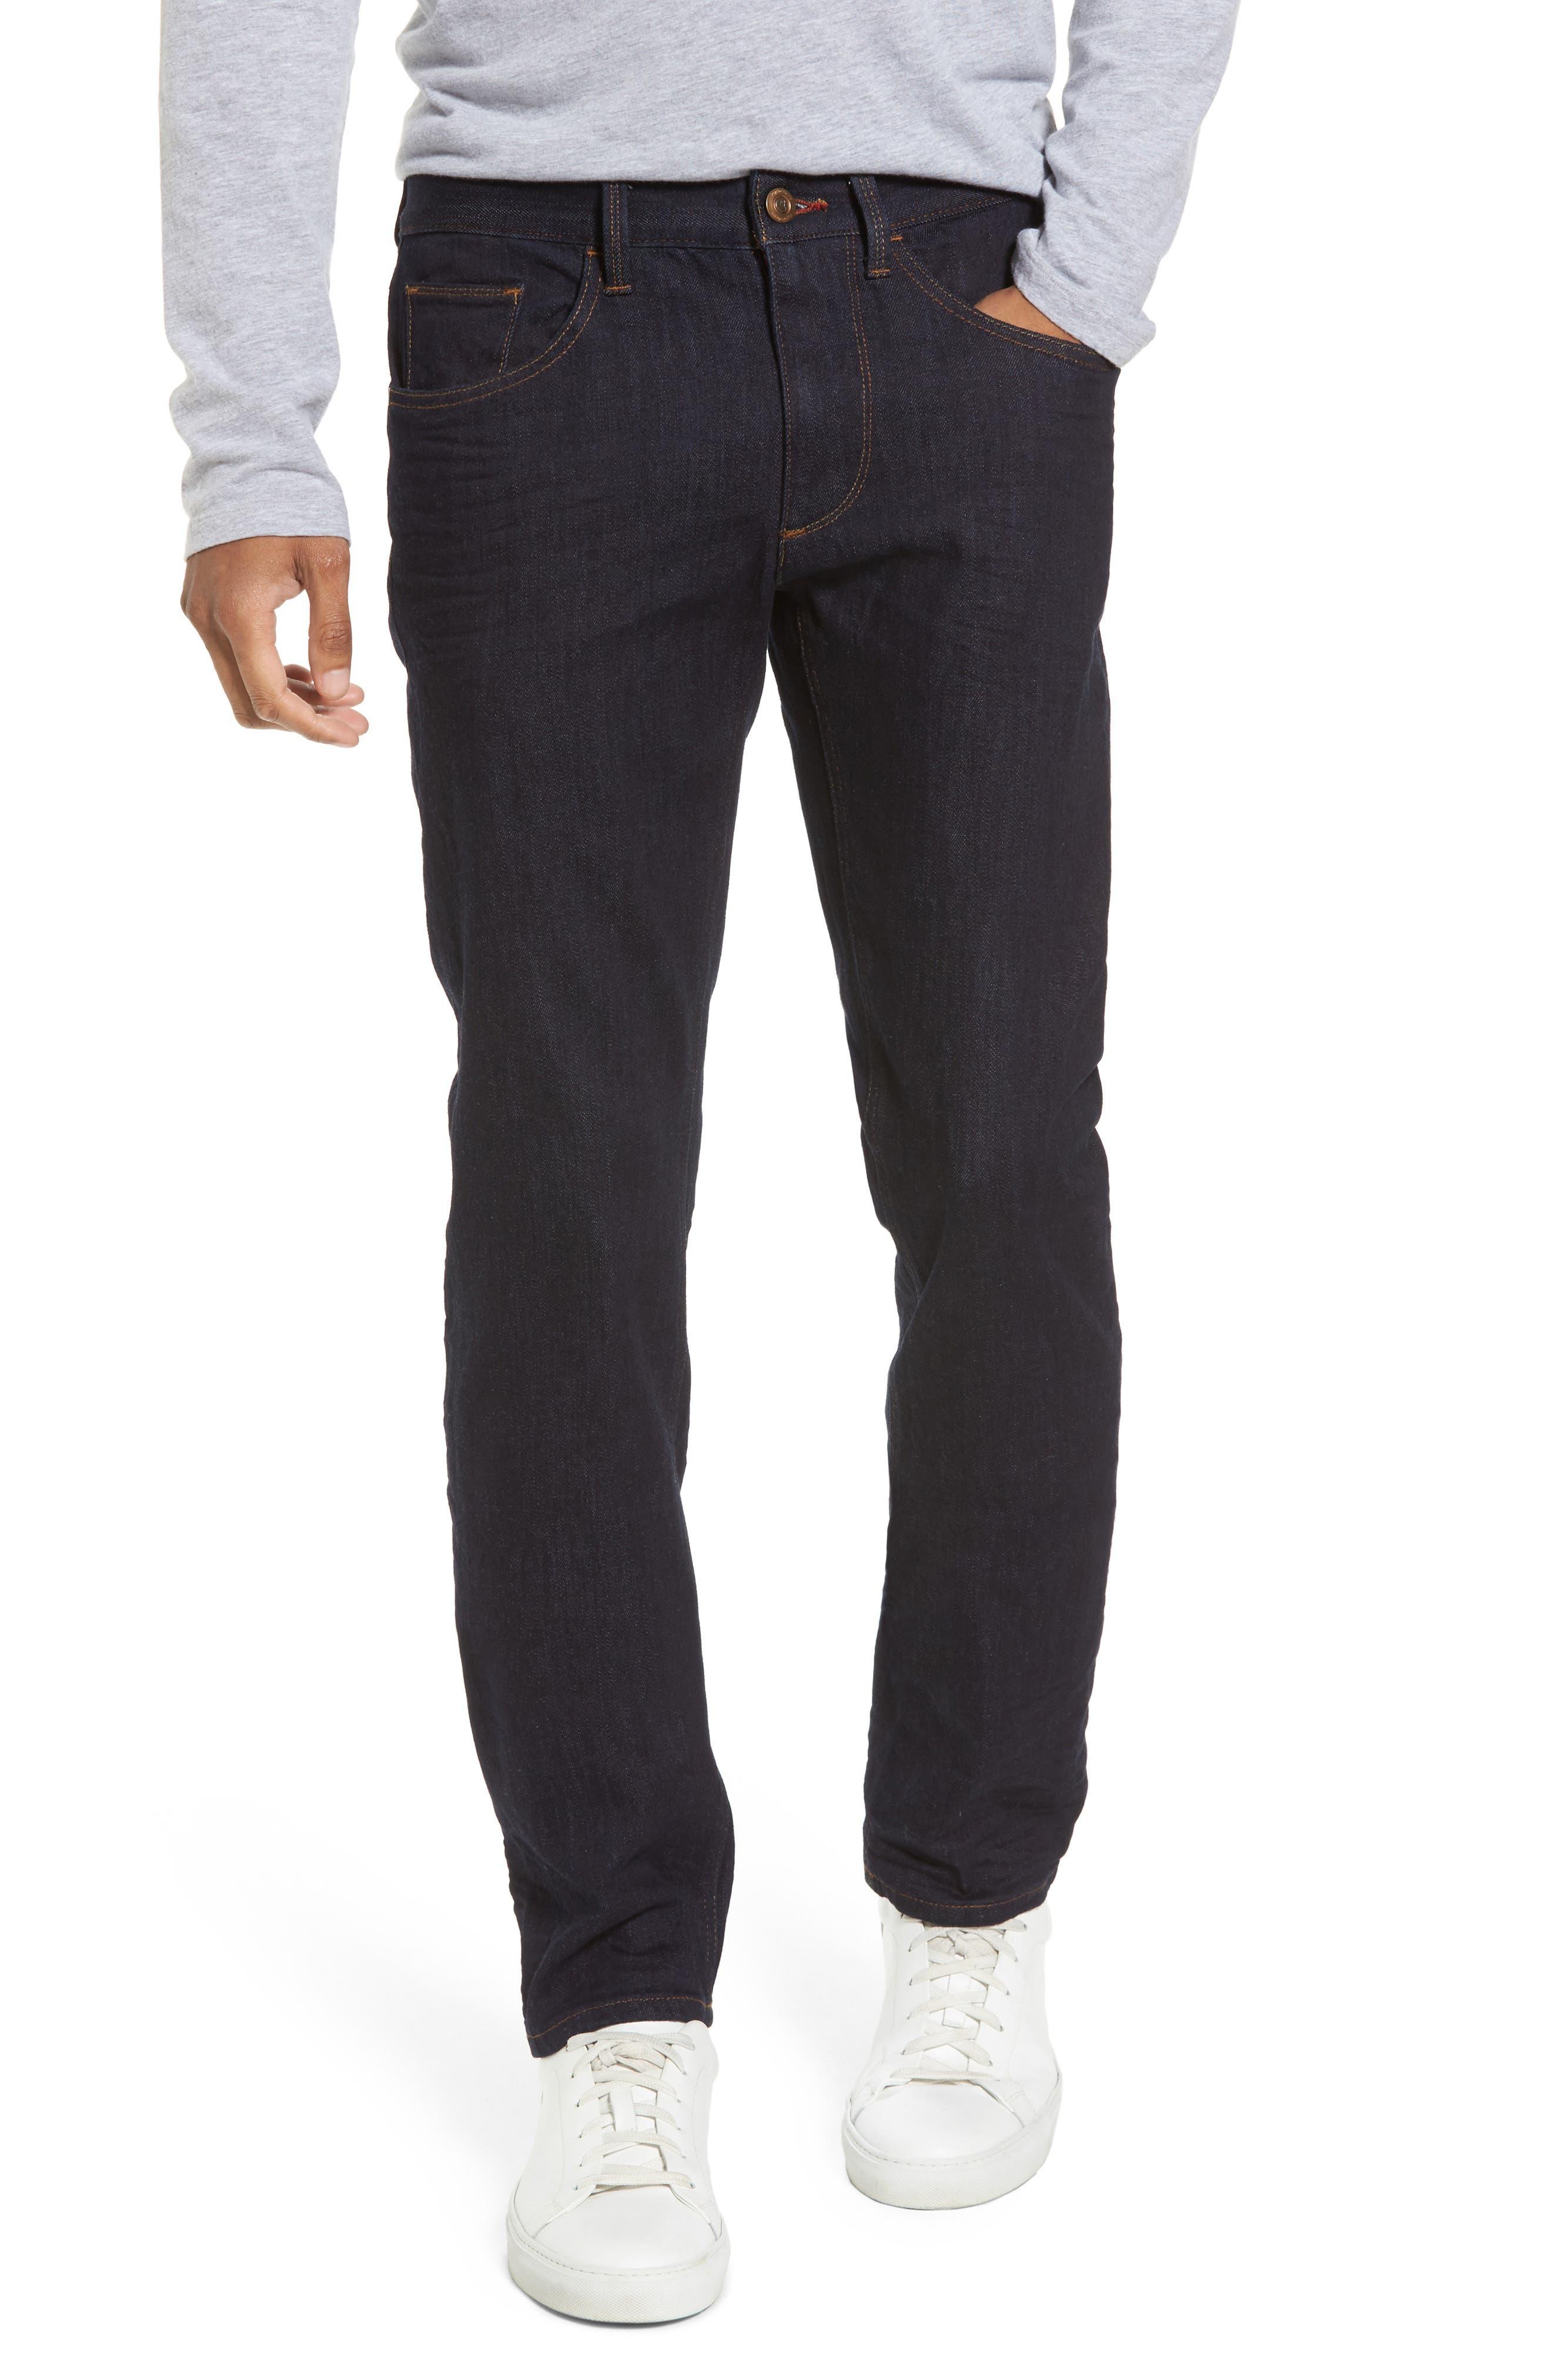 Canal Slim Fit Jeans,                             Main thumbnail 1, color,                             460